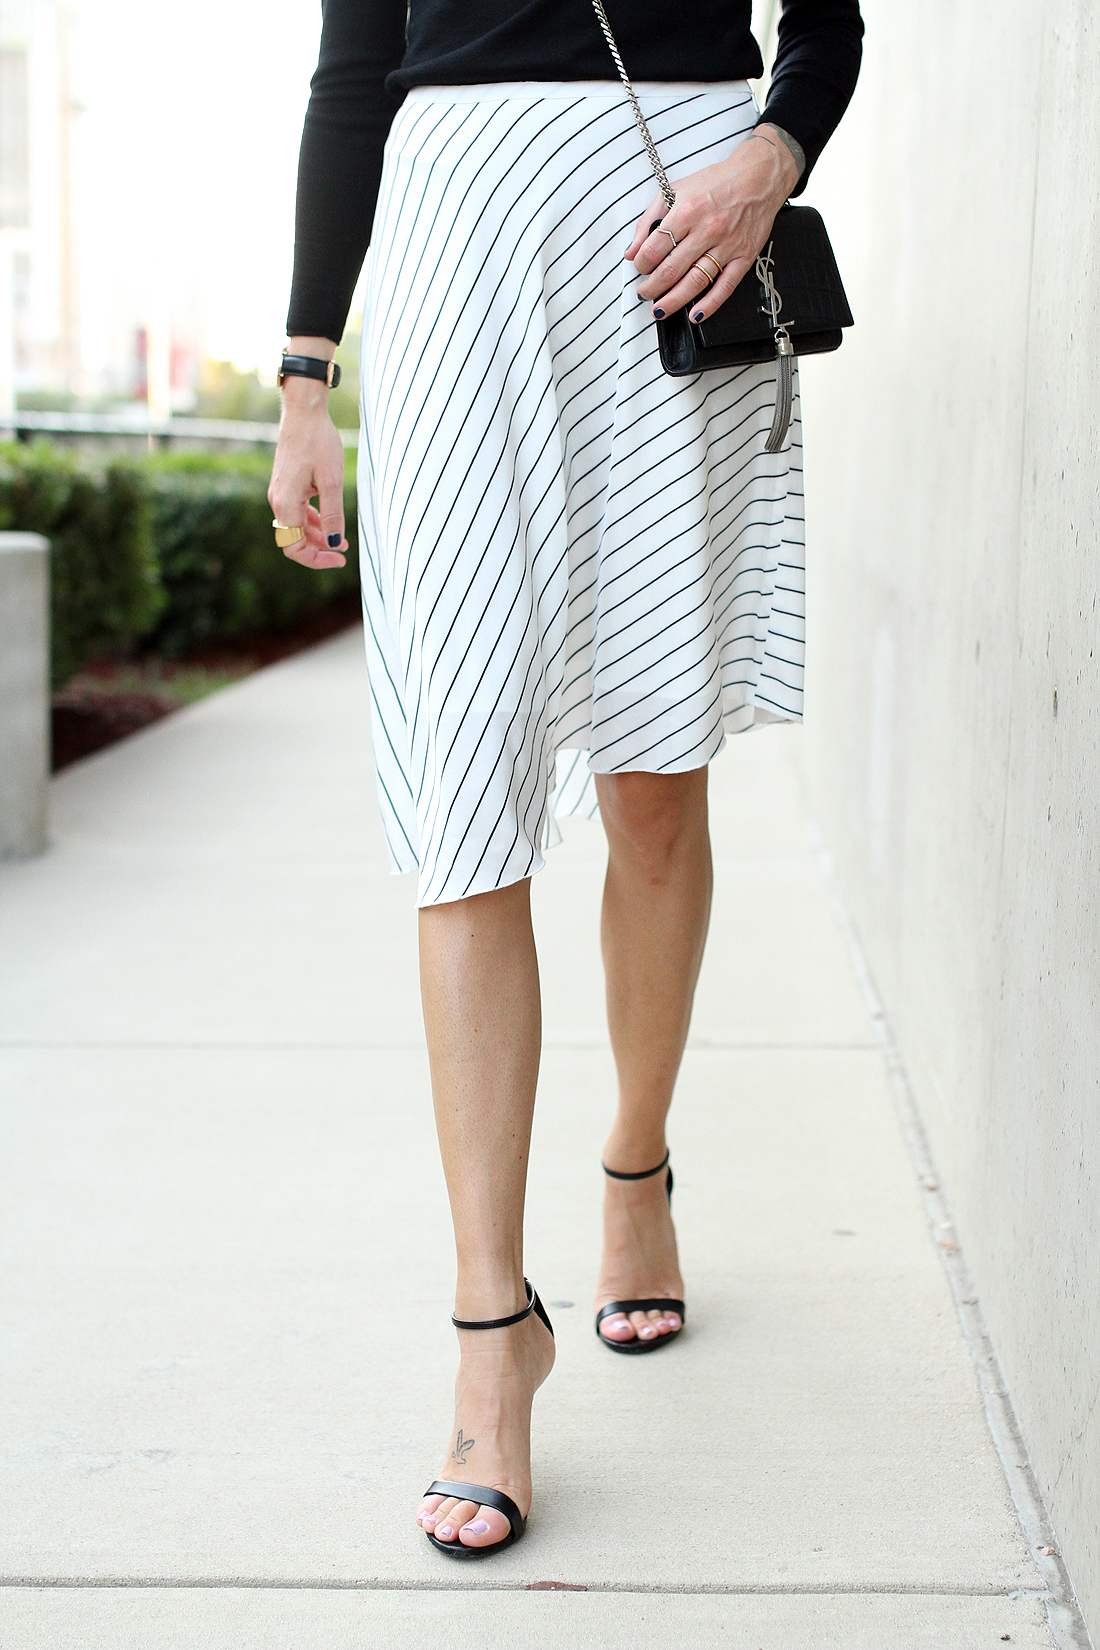 fashion-jackson-club-monaco-white-asymmetrical-skirt-black-ankle-strap-heels-saint-laurent-crossbody